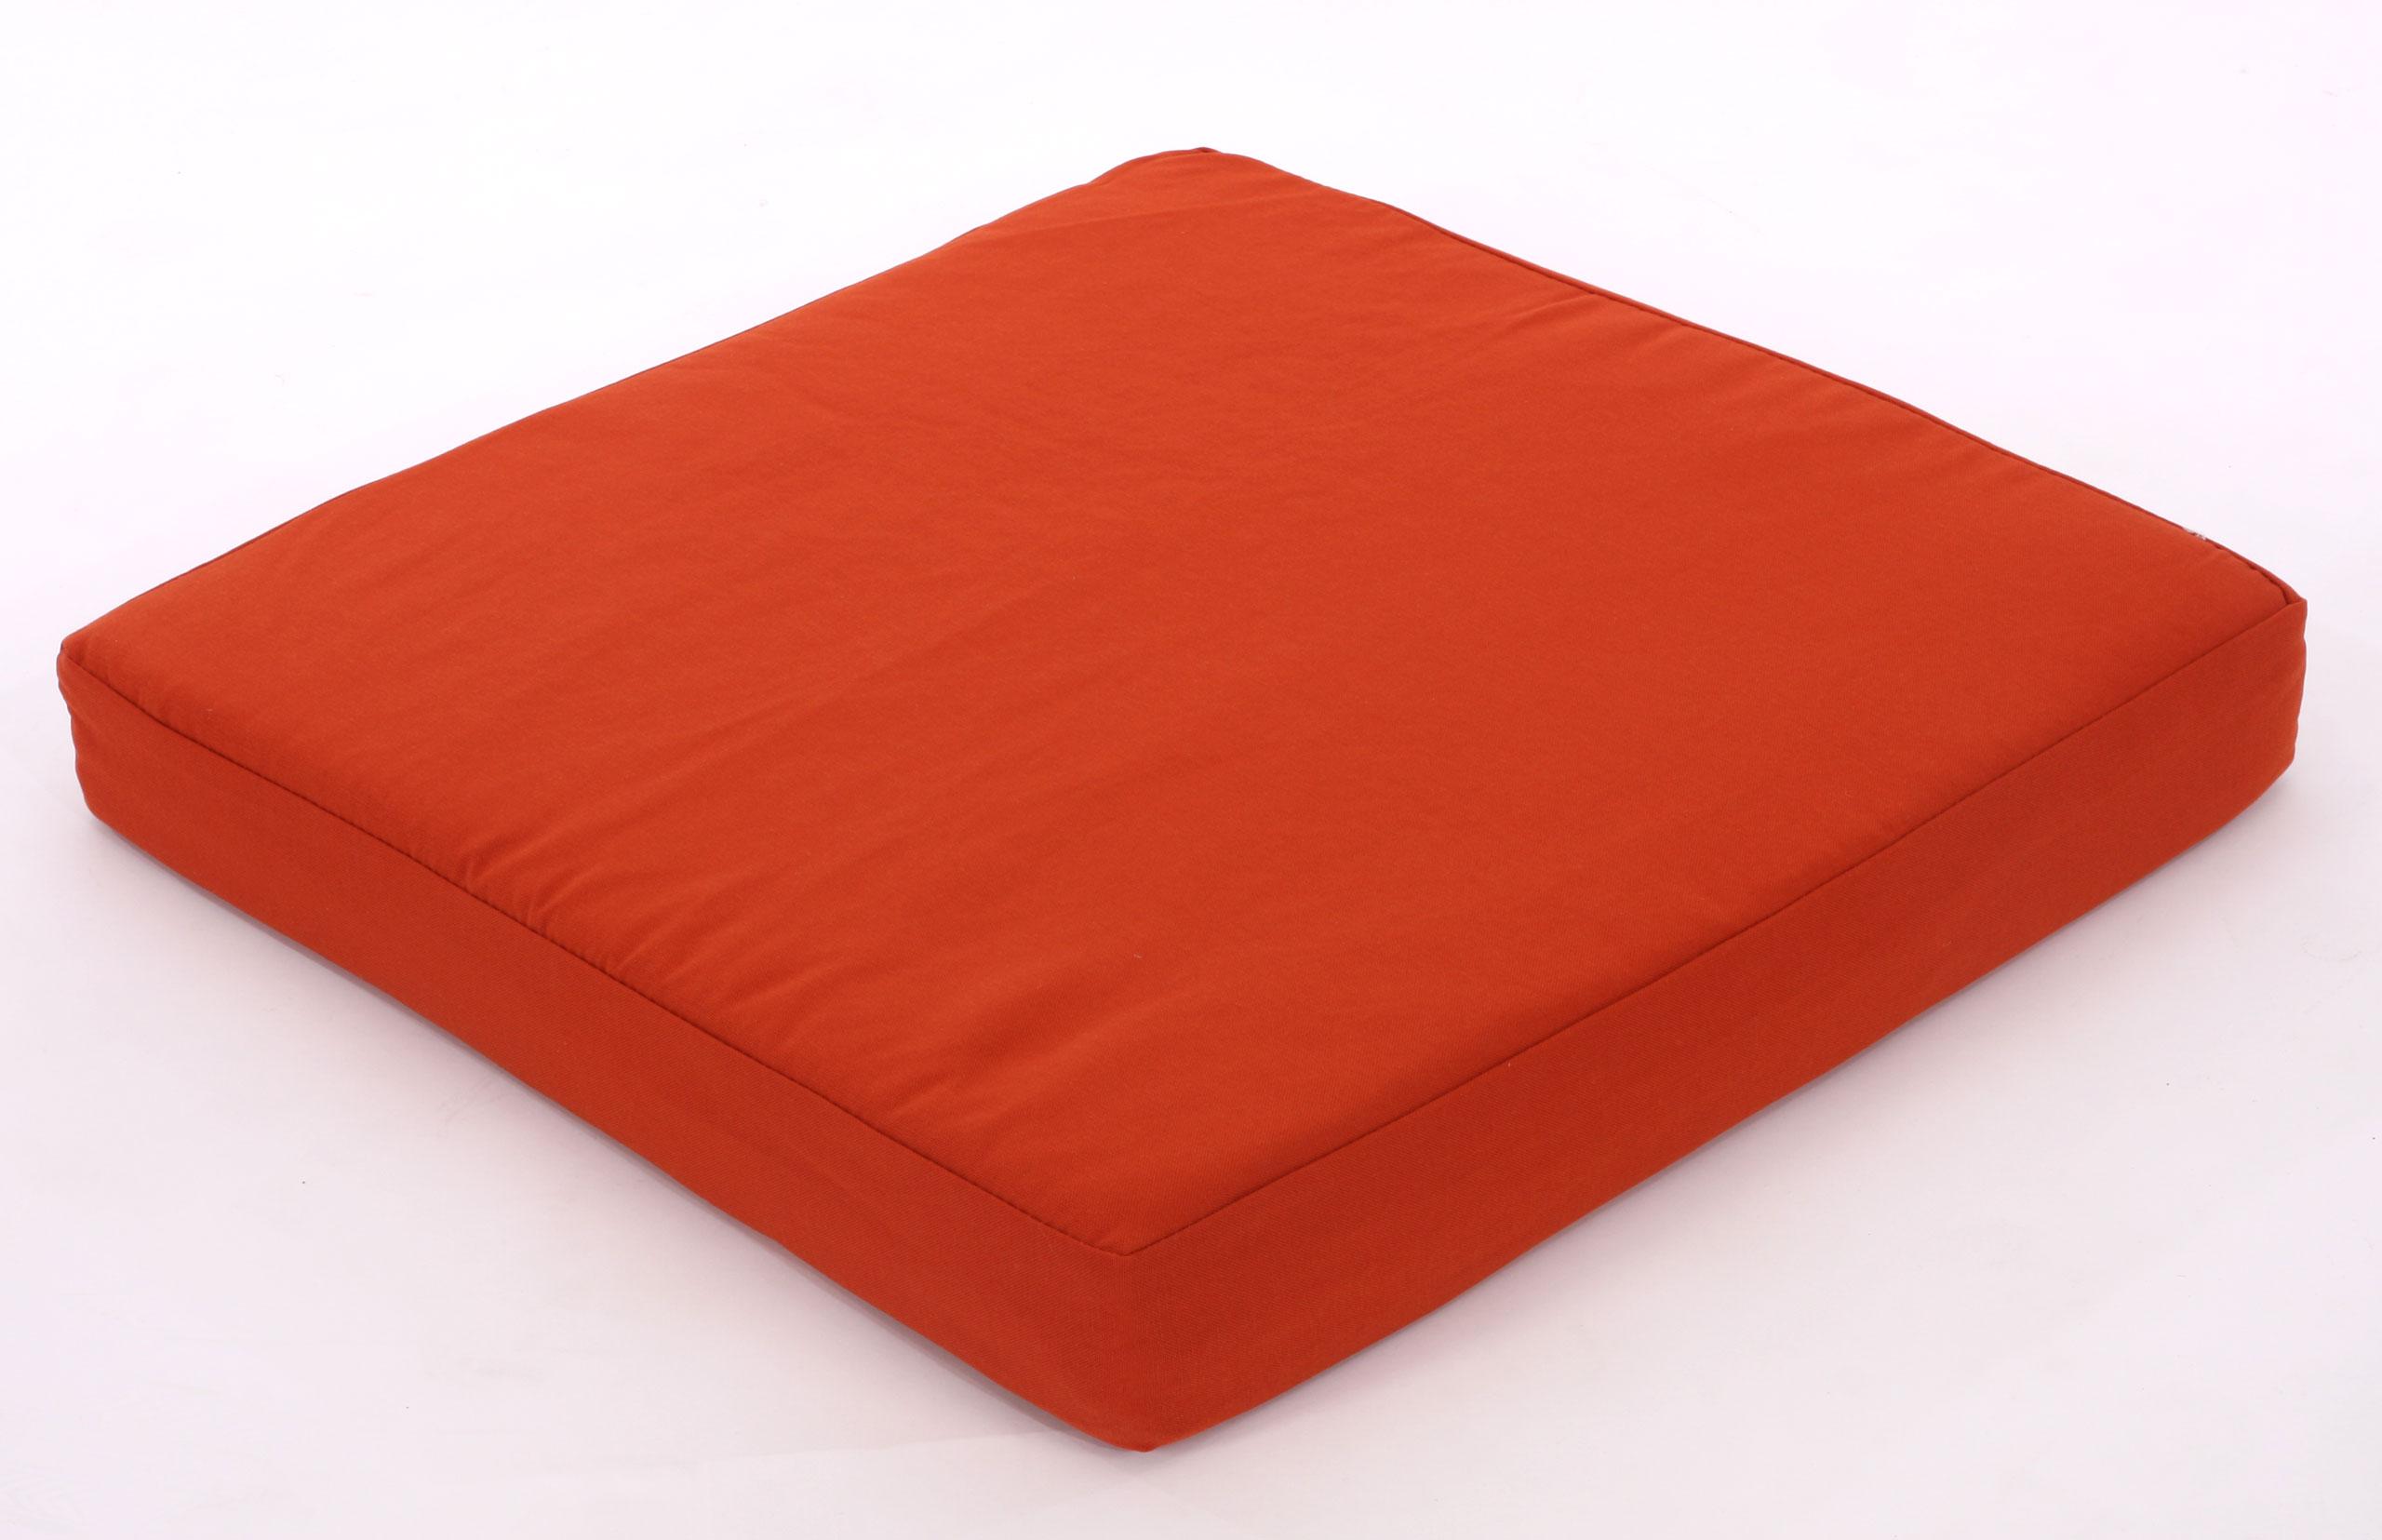 sitzkissen kissen f r gartenstuhl 57 5cm x 57 5cm bordeaux. Black Bedroom Furniture Sets. Home Design Ideas